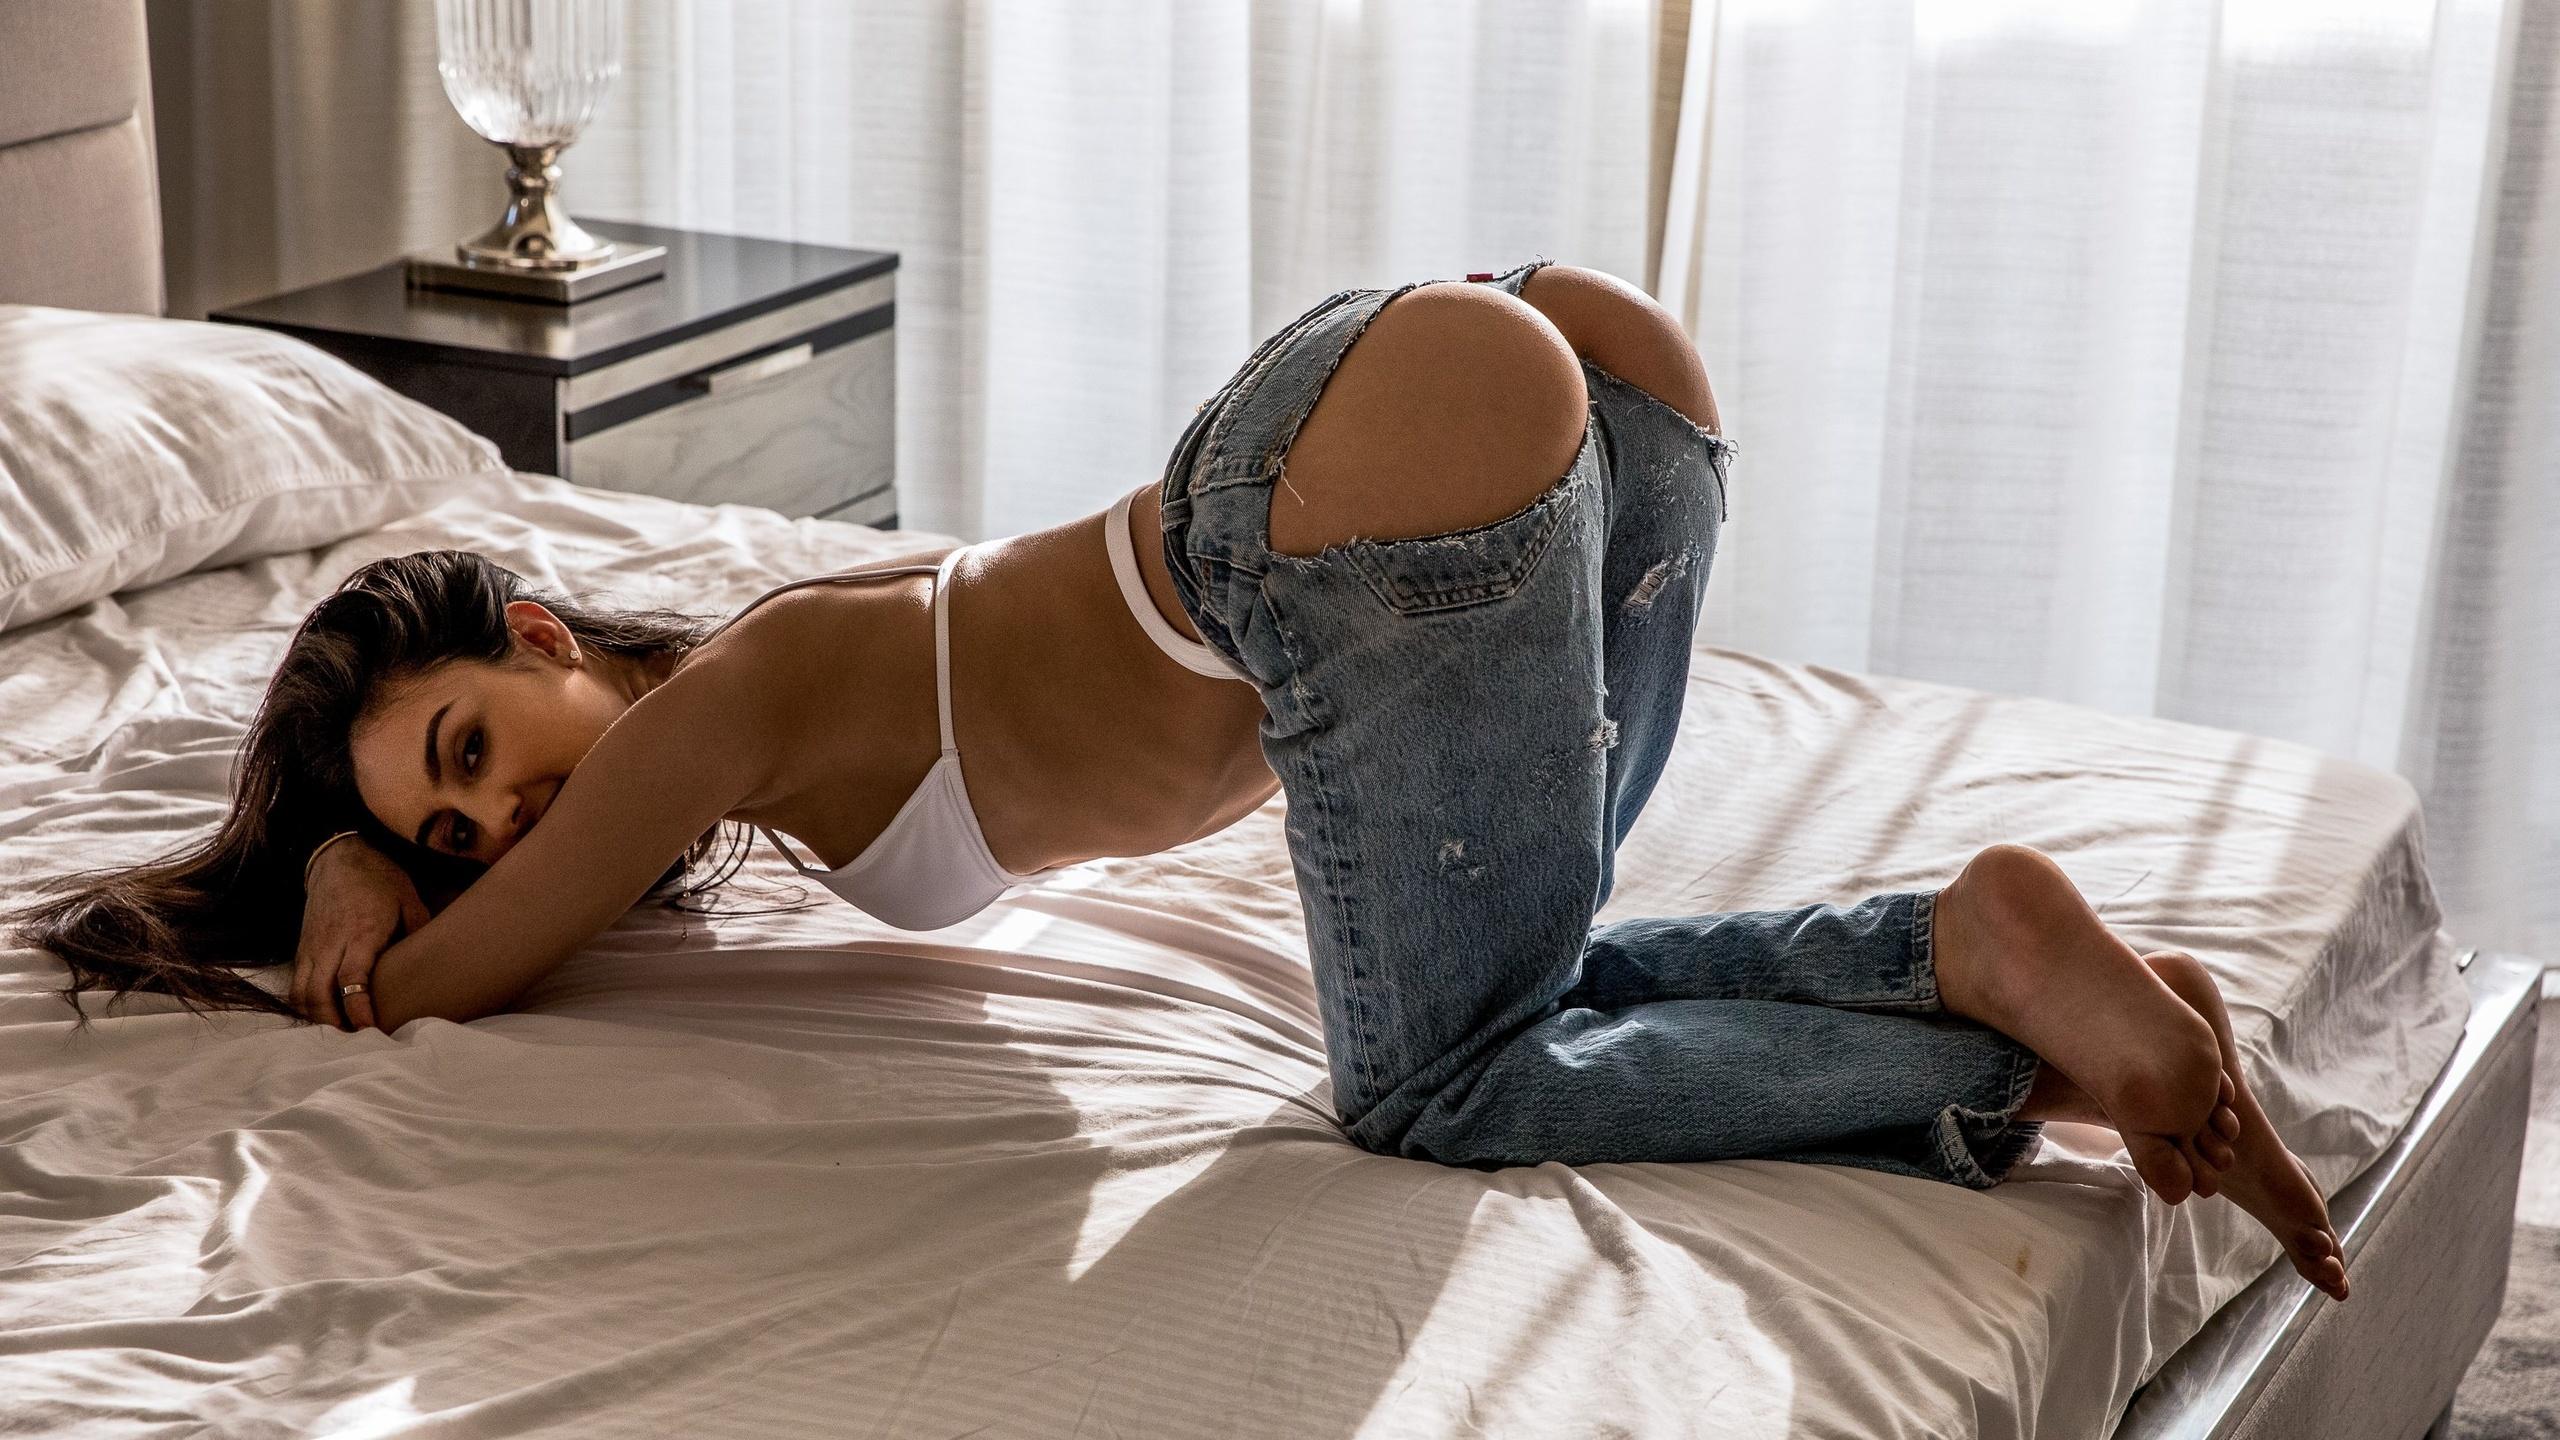 Denim model sex tape